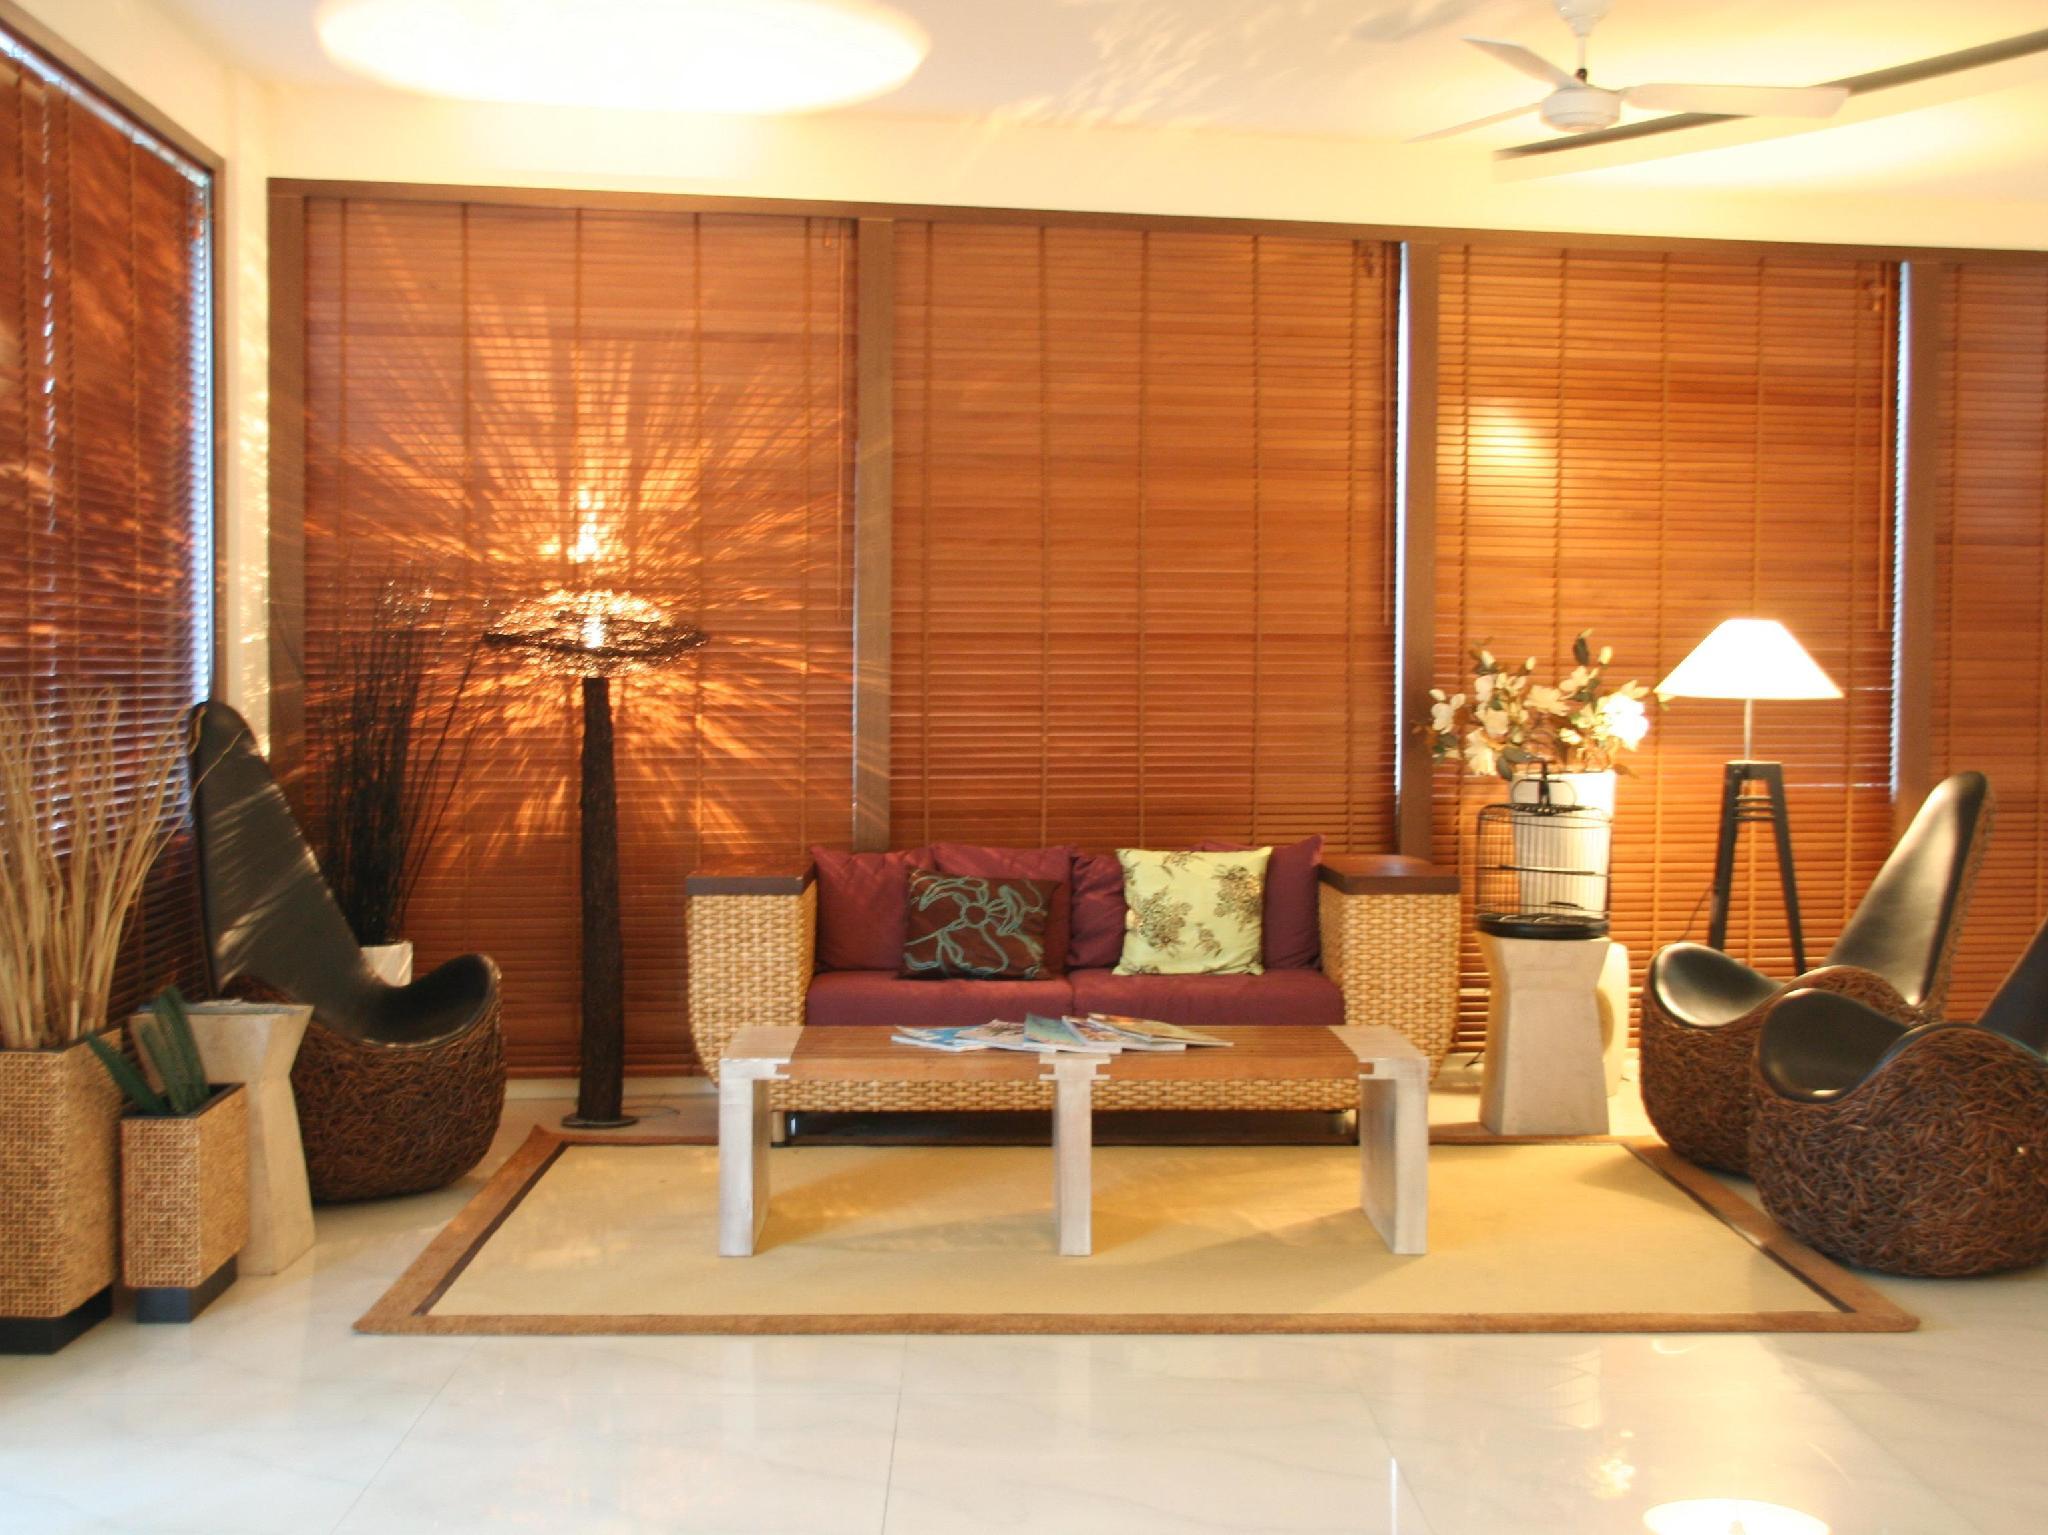 Bali Suites Hotel Green Island 绿岛峇里商旅